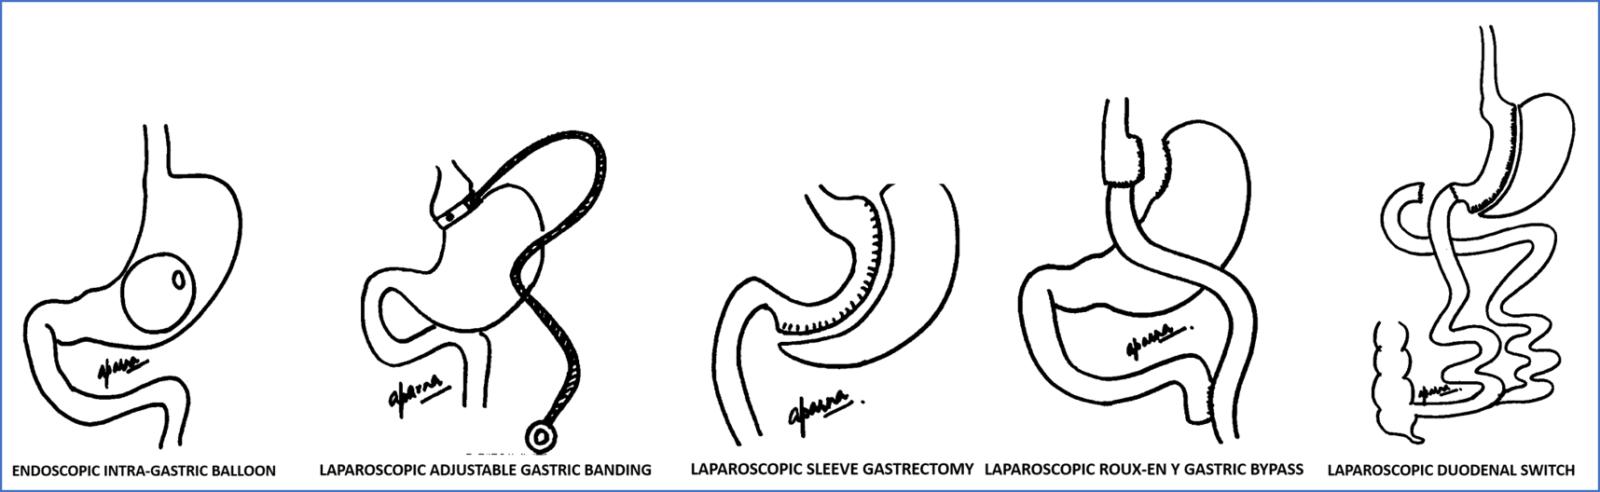 type of bariatric surgery in mumbai, india